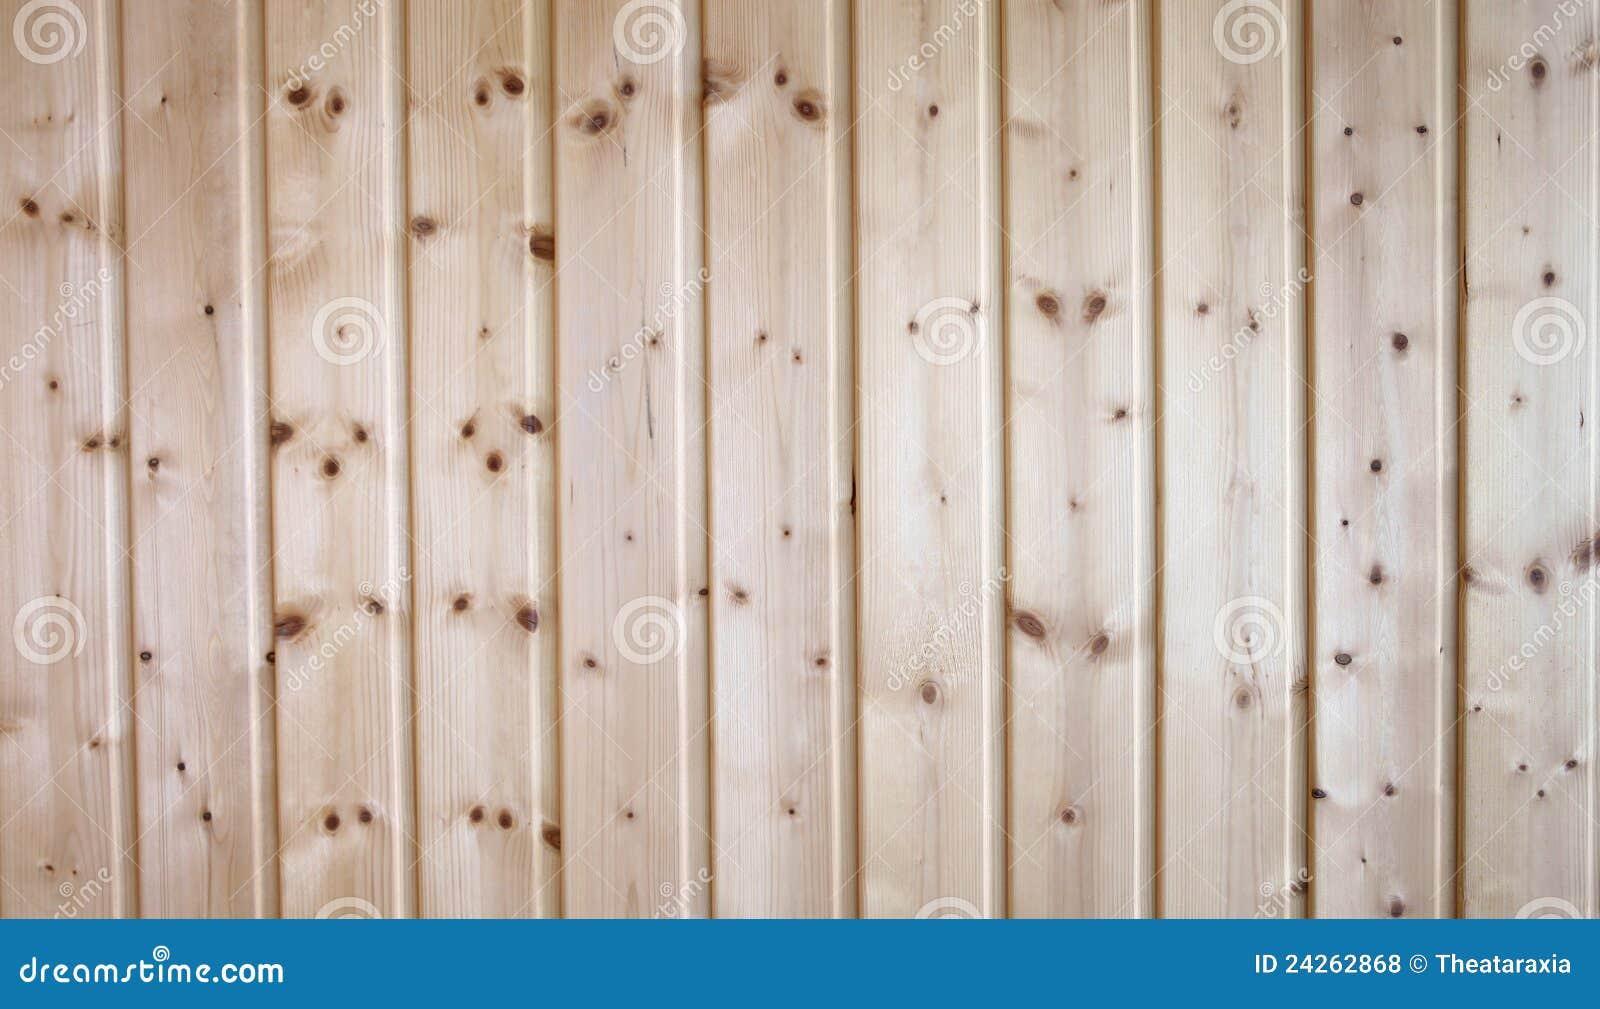 Pared de madera de la sauna fotos de archivo libres de - Madera para sauna ...